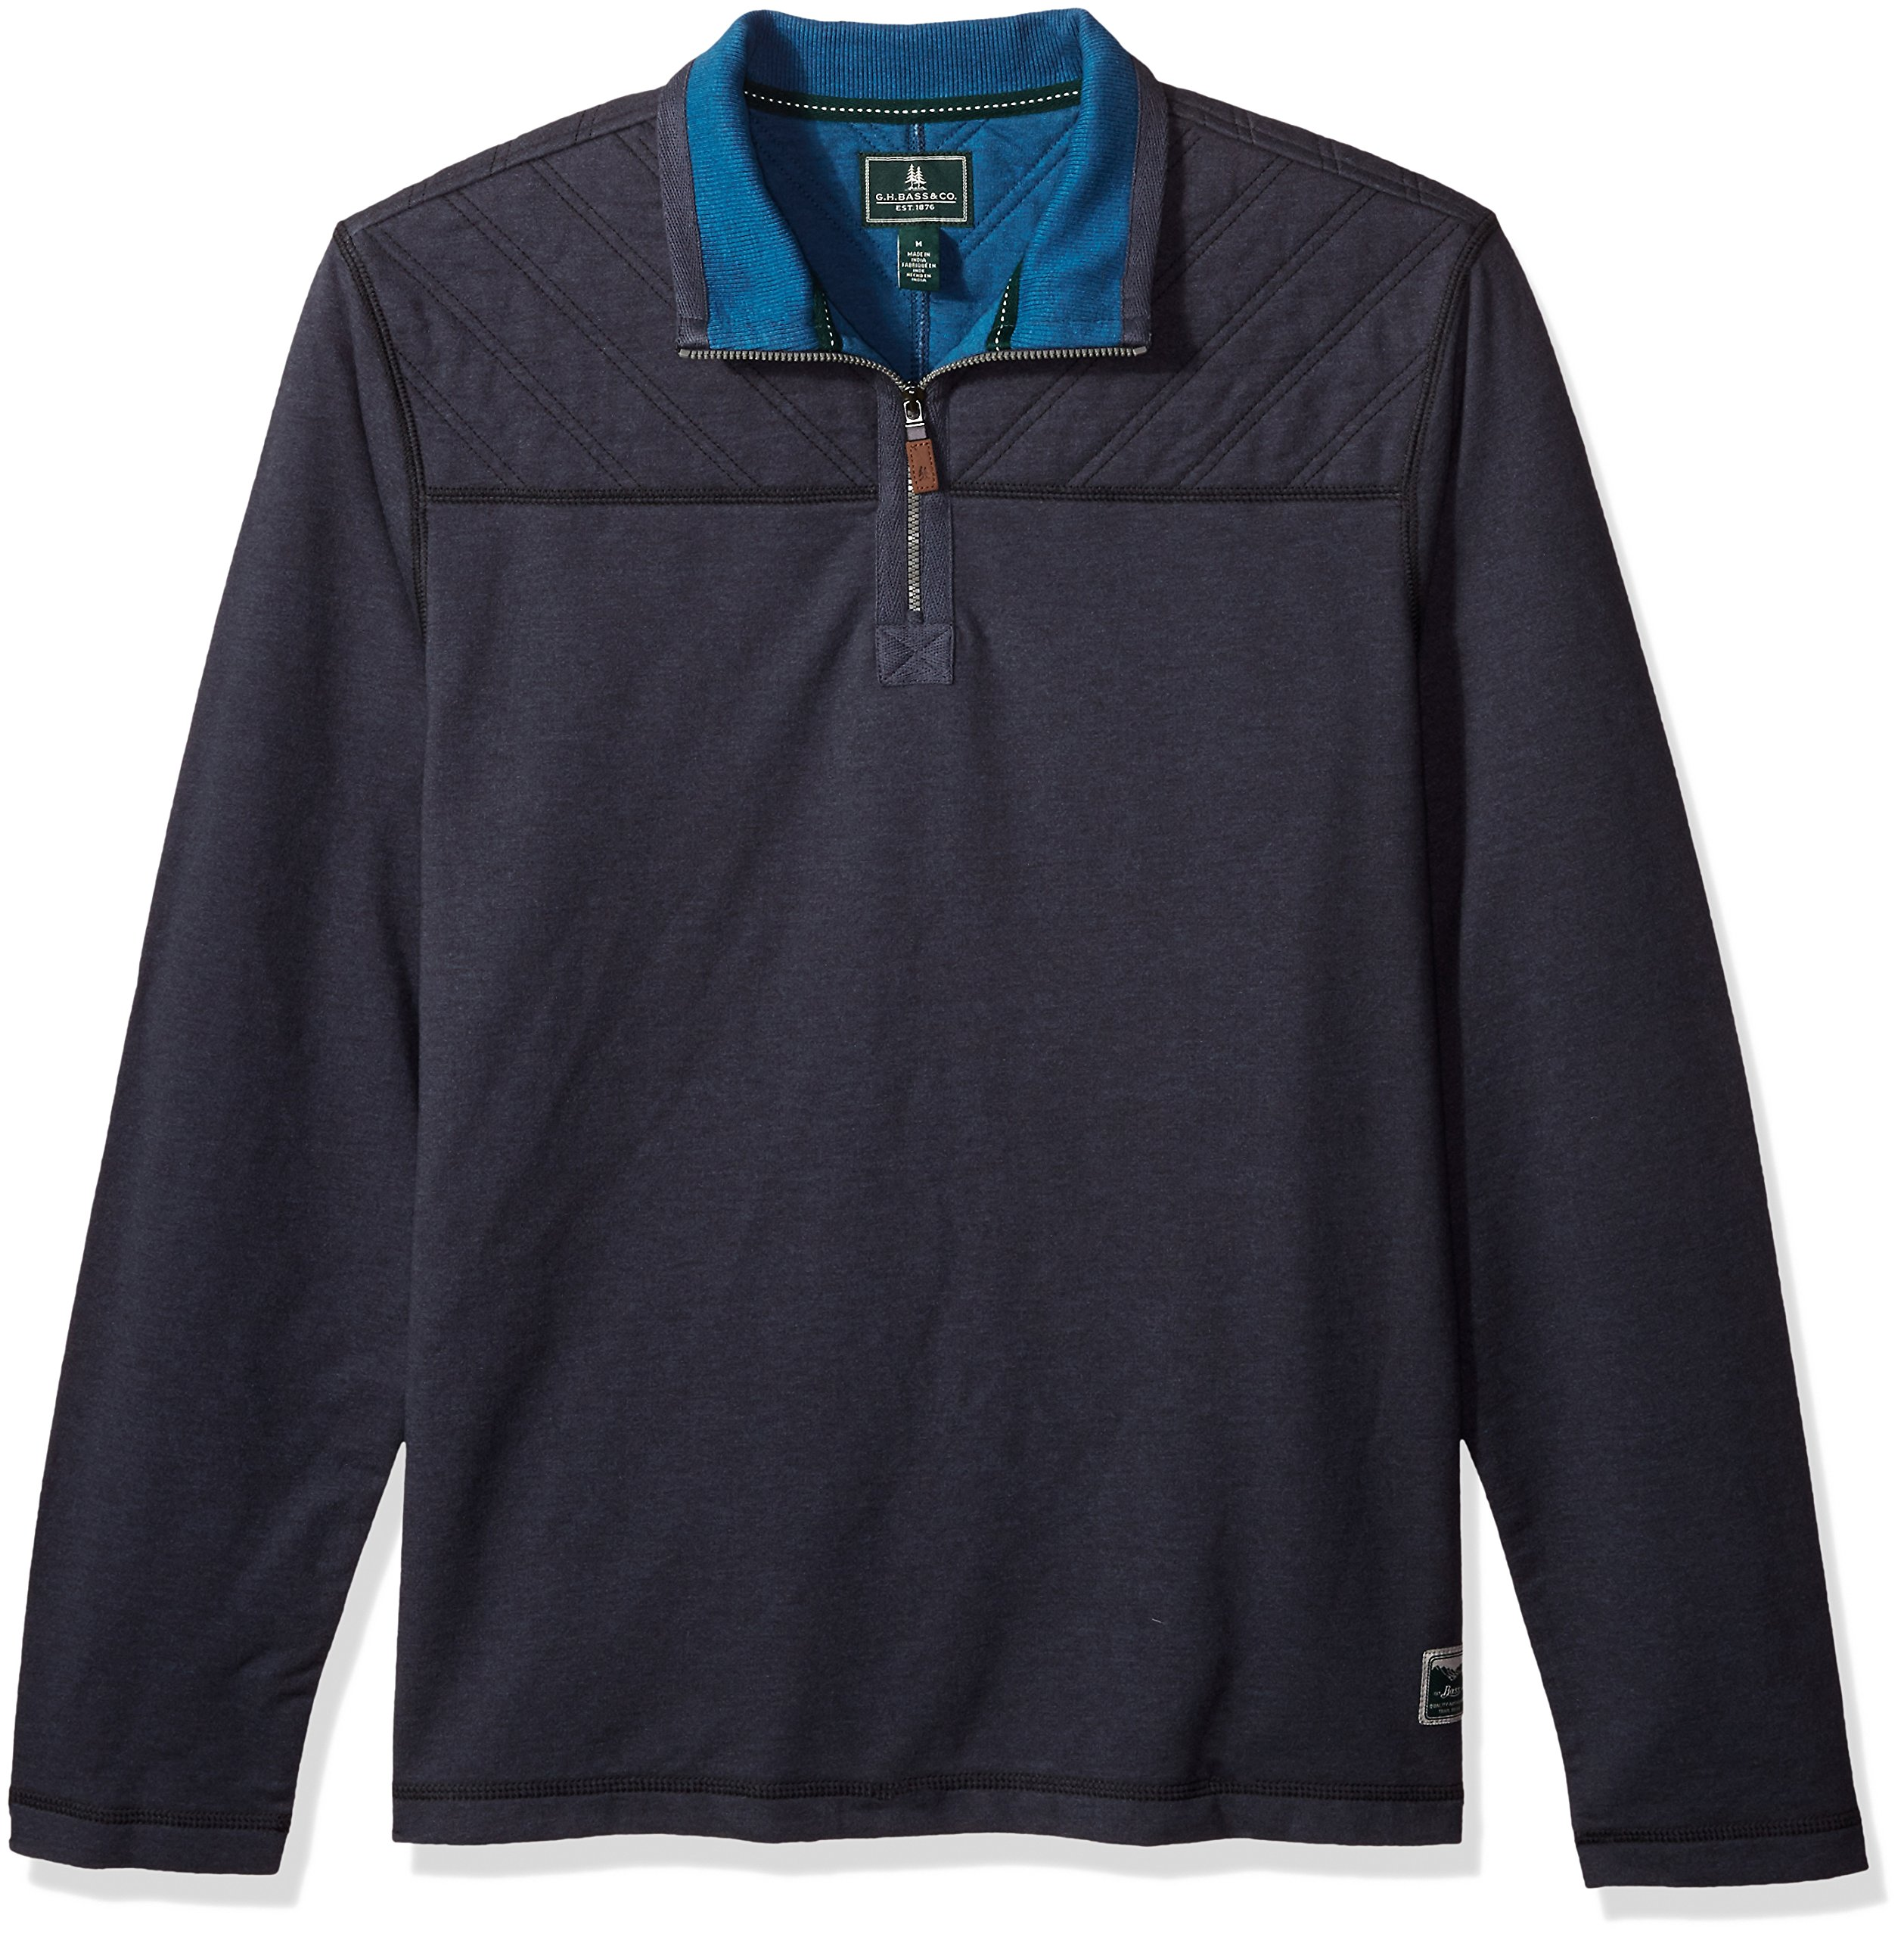 G.H. Bass & Co. Men's Quilted 1/2 Zip Fleece, Blue Nights Heather, Large